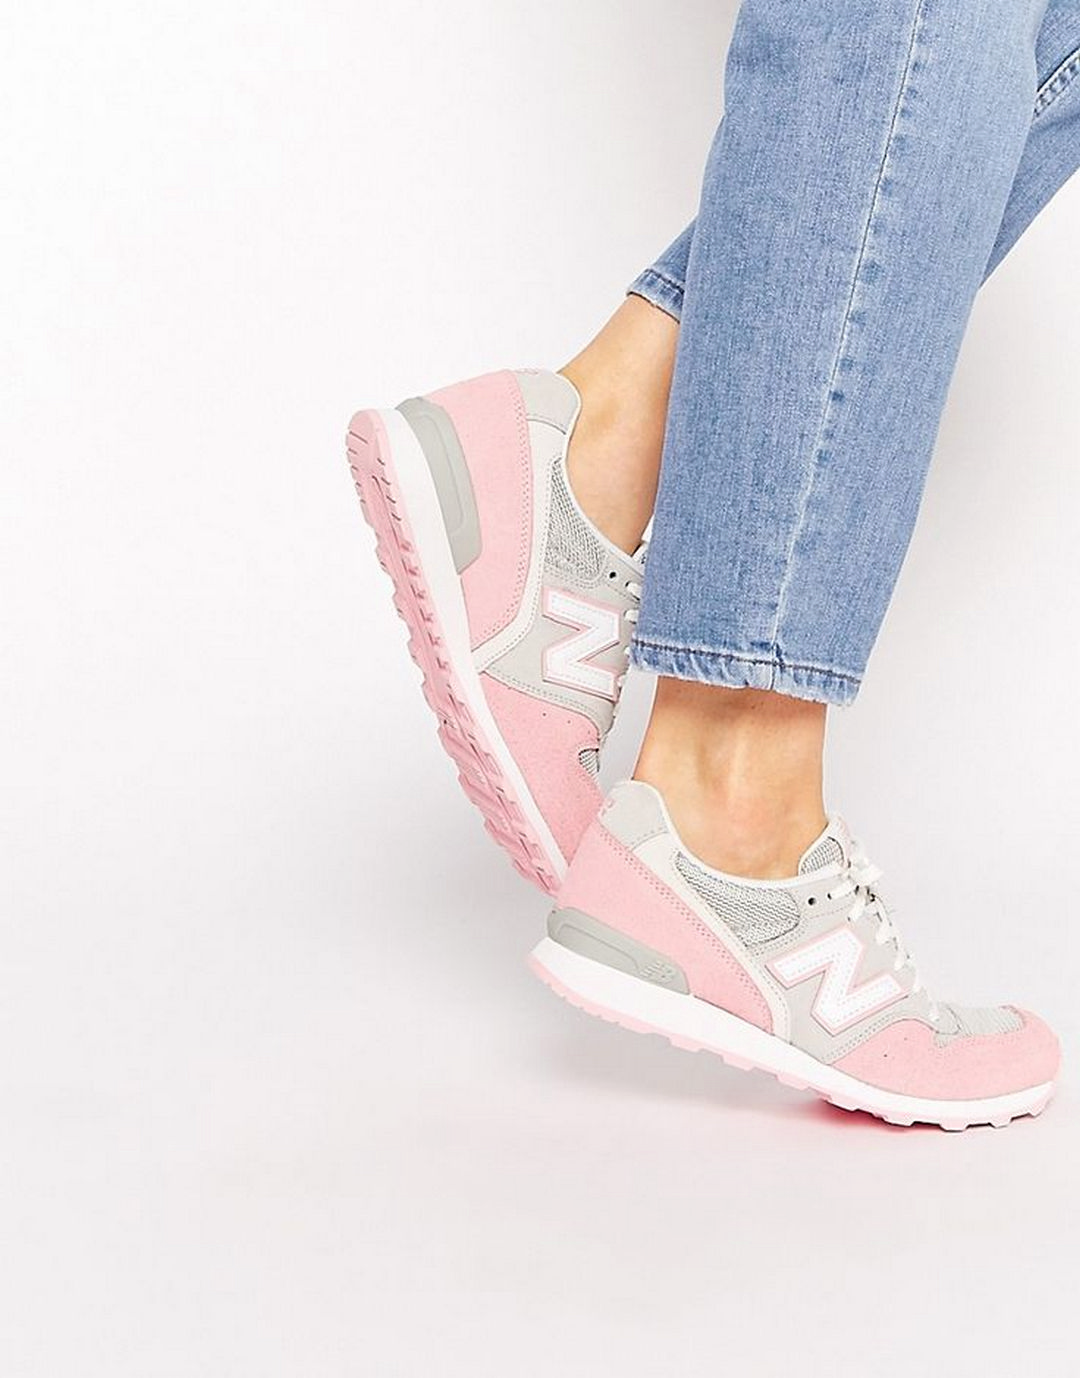 Grenson x New Balance M576: Best Shoes for Men | Trendy ...